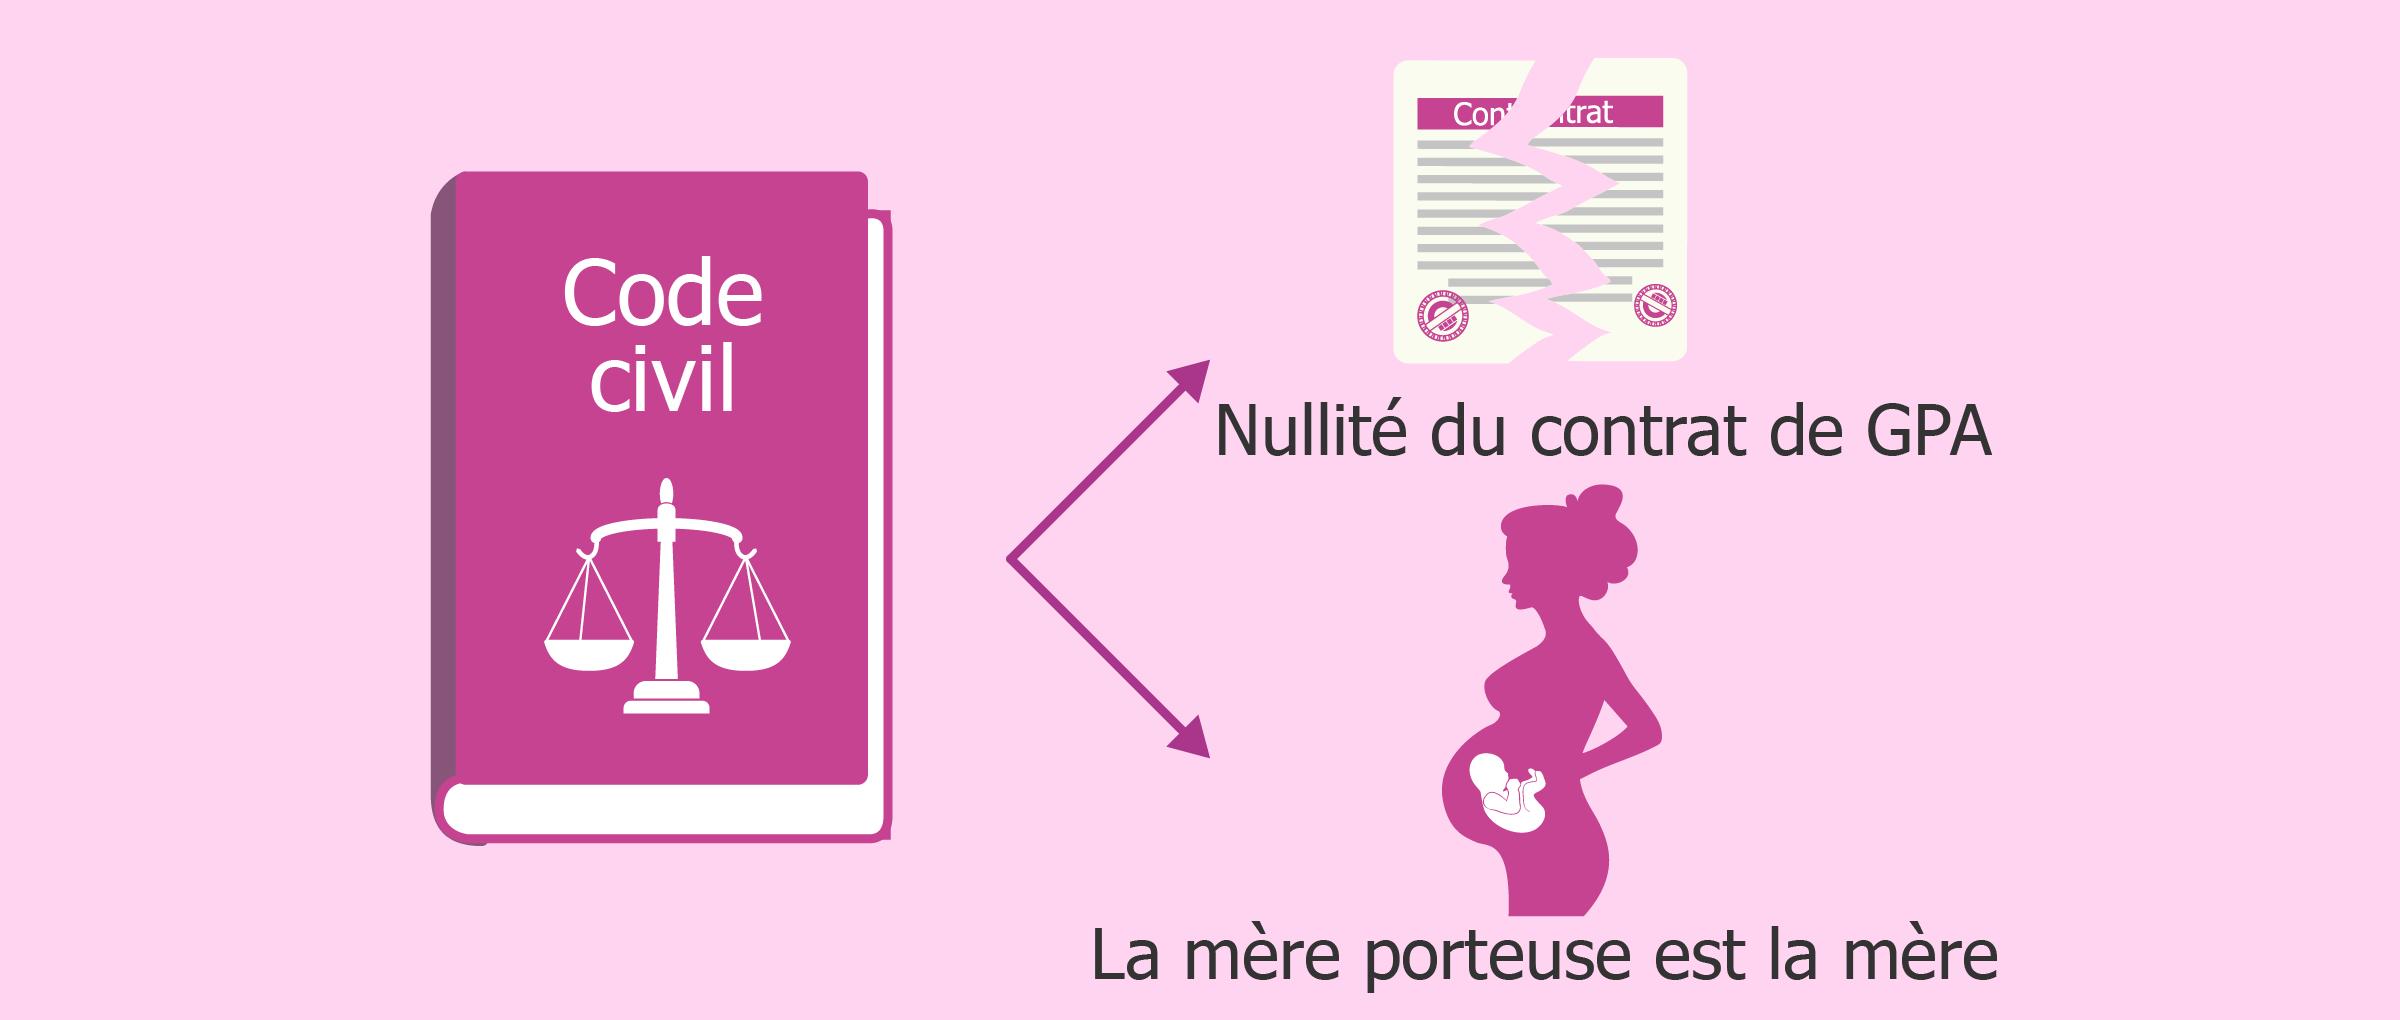 La GPA est interdite en France